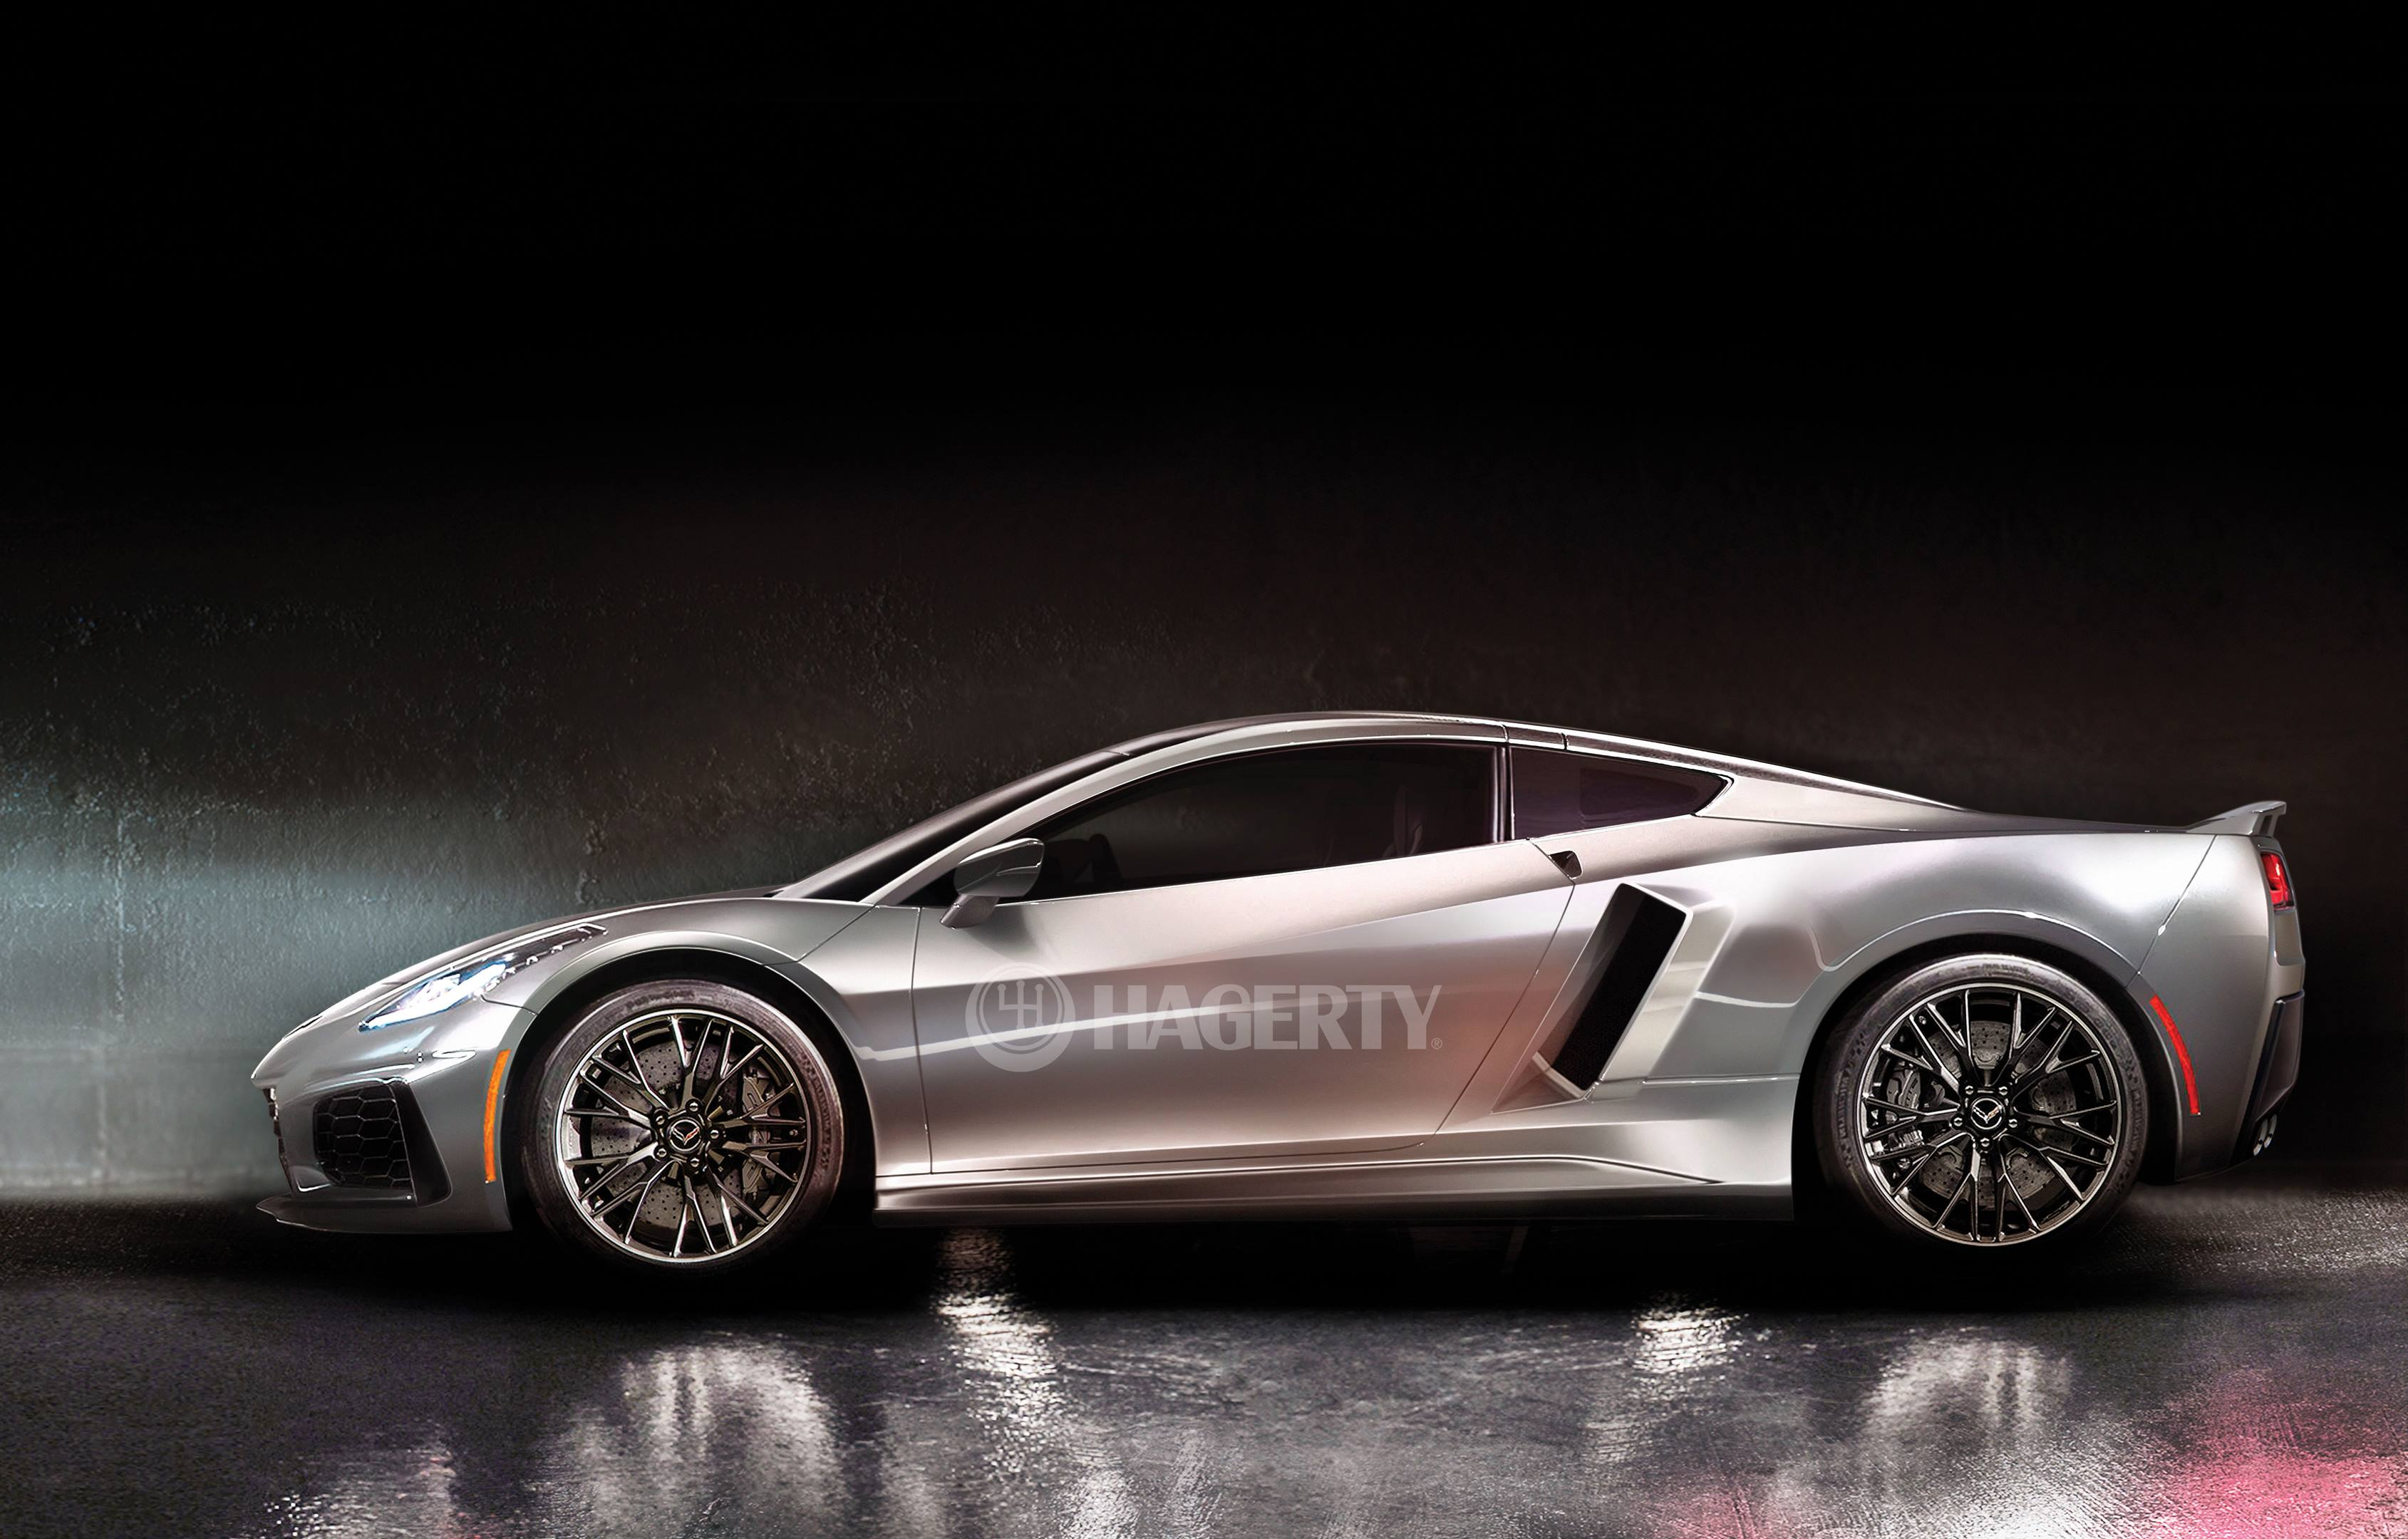 The All New mid-engine Chevrolet Corvette C8